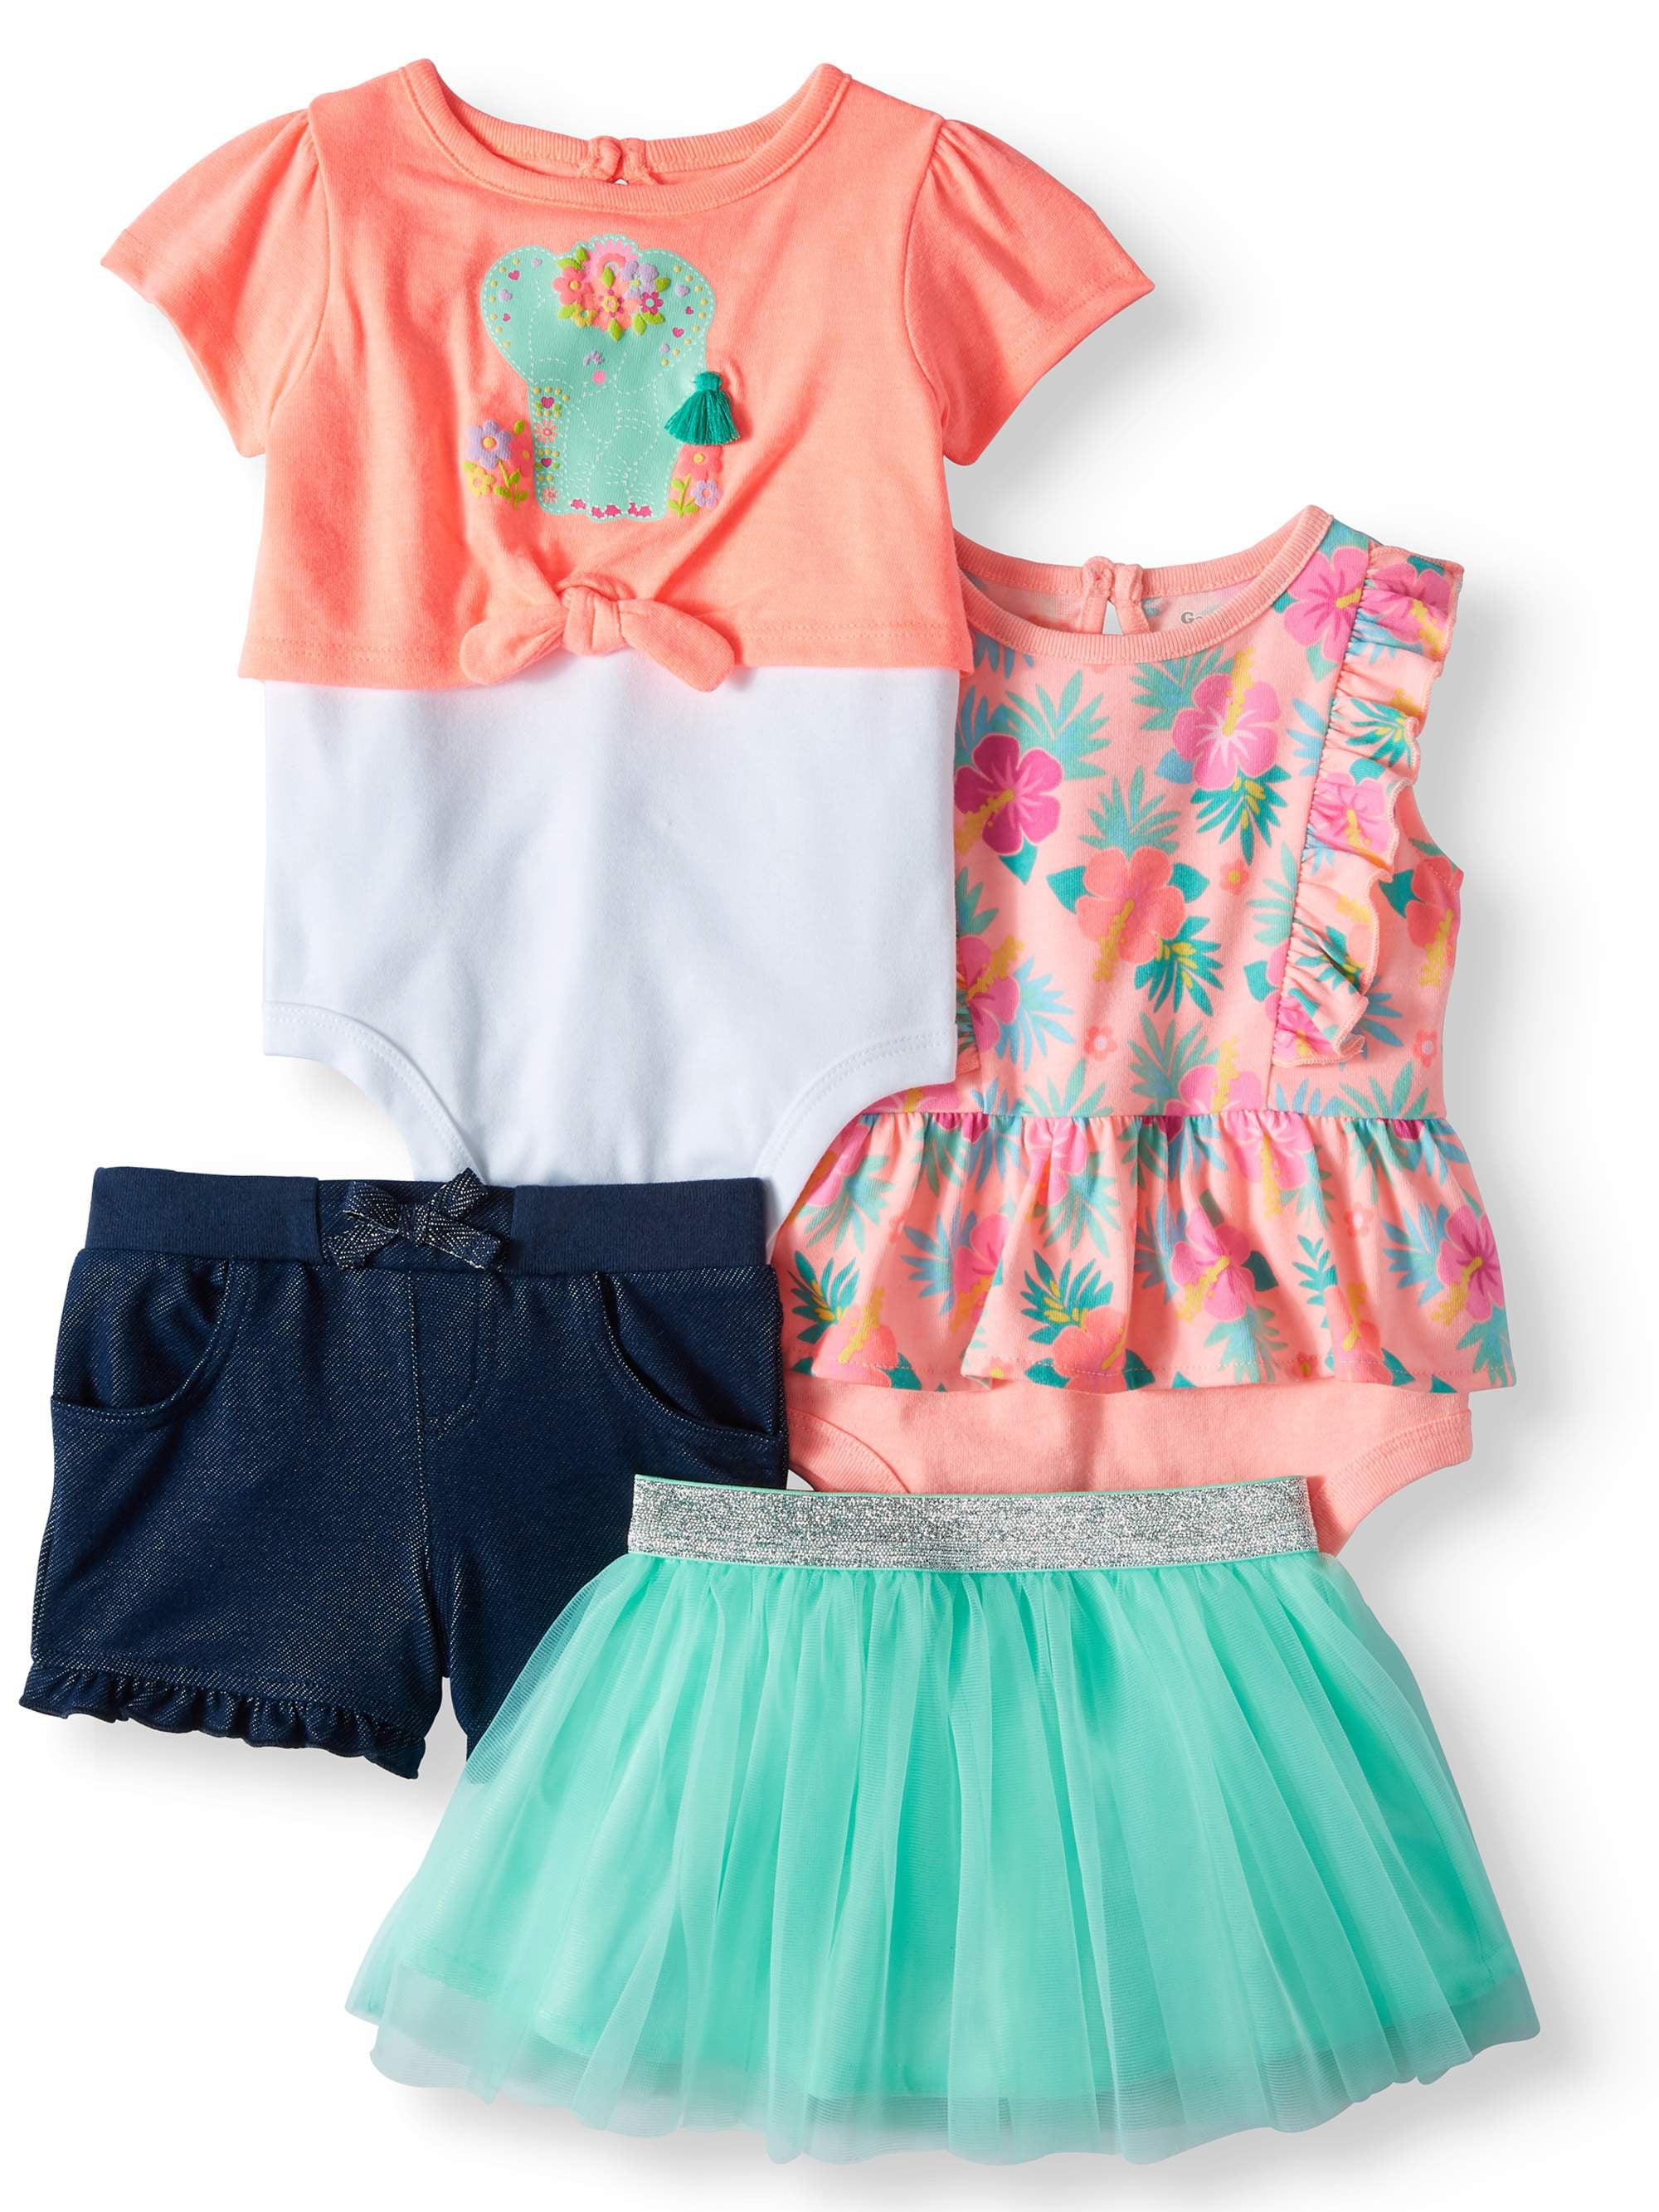 Print Peplum Bodysuit, 2fer Tie-Front Bodysuit, Shorts & Tutu, 4pc Outfit Set (Baby Girls)